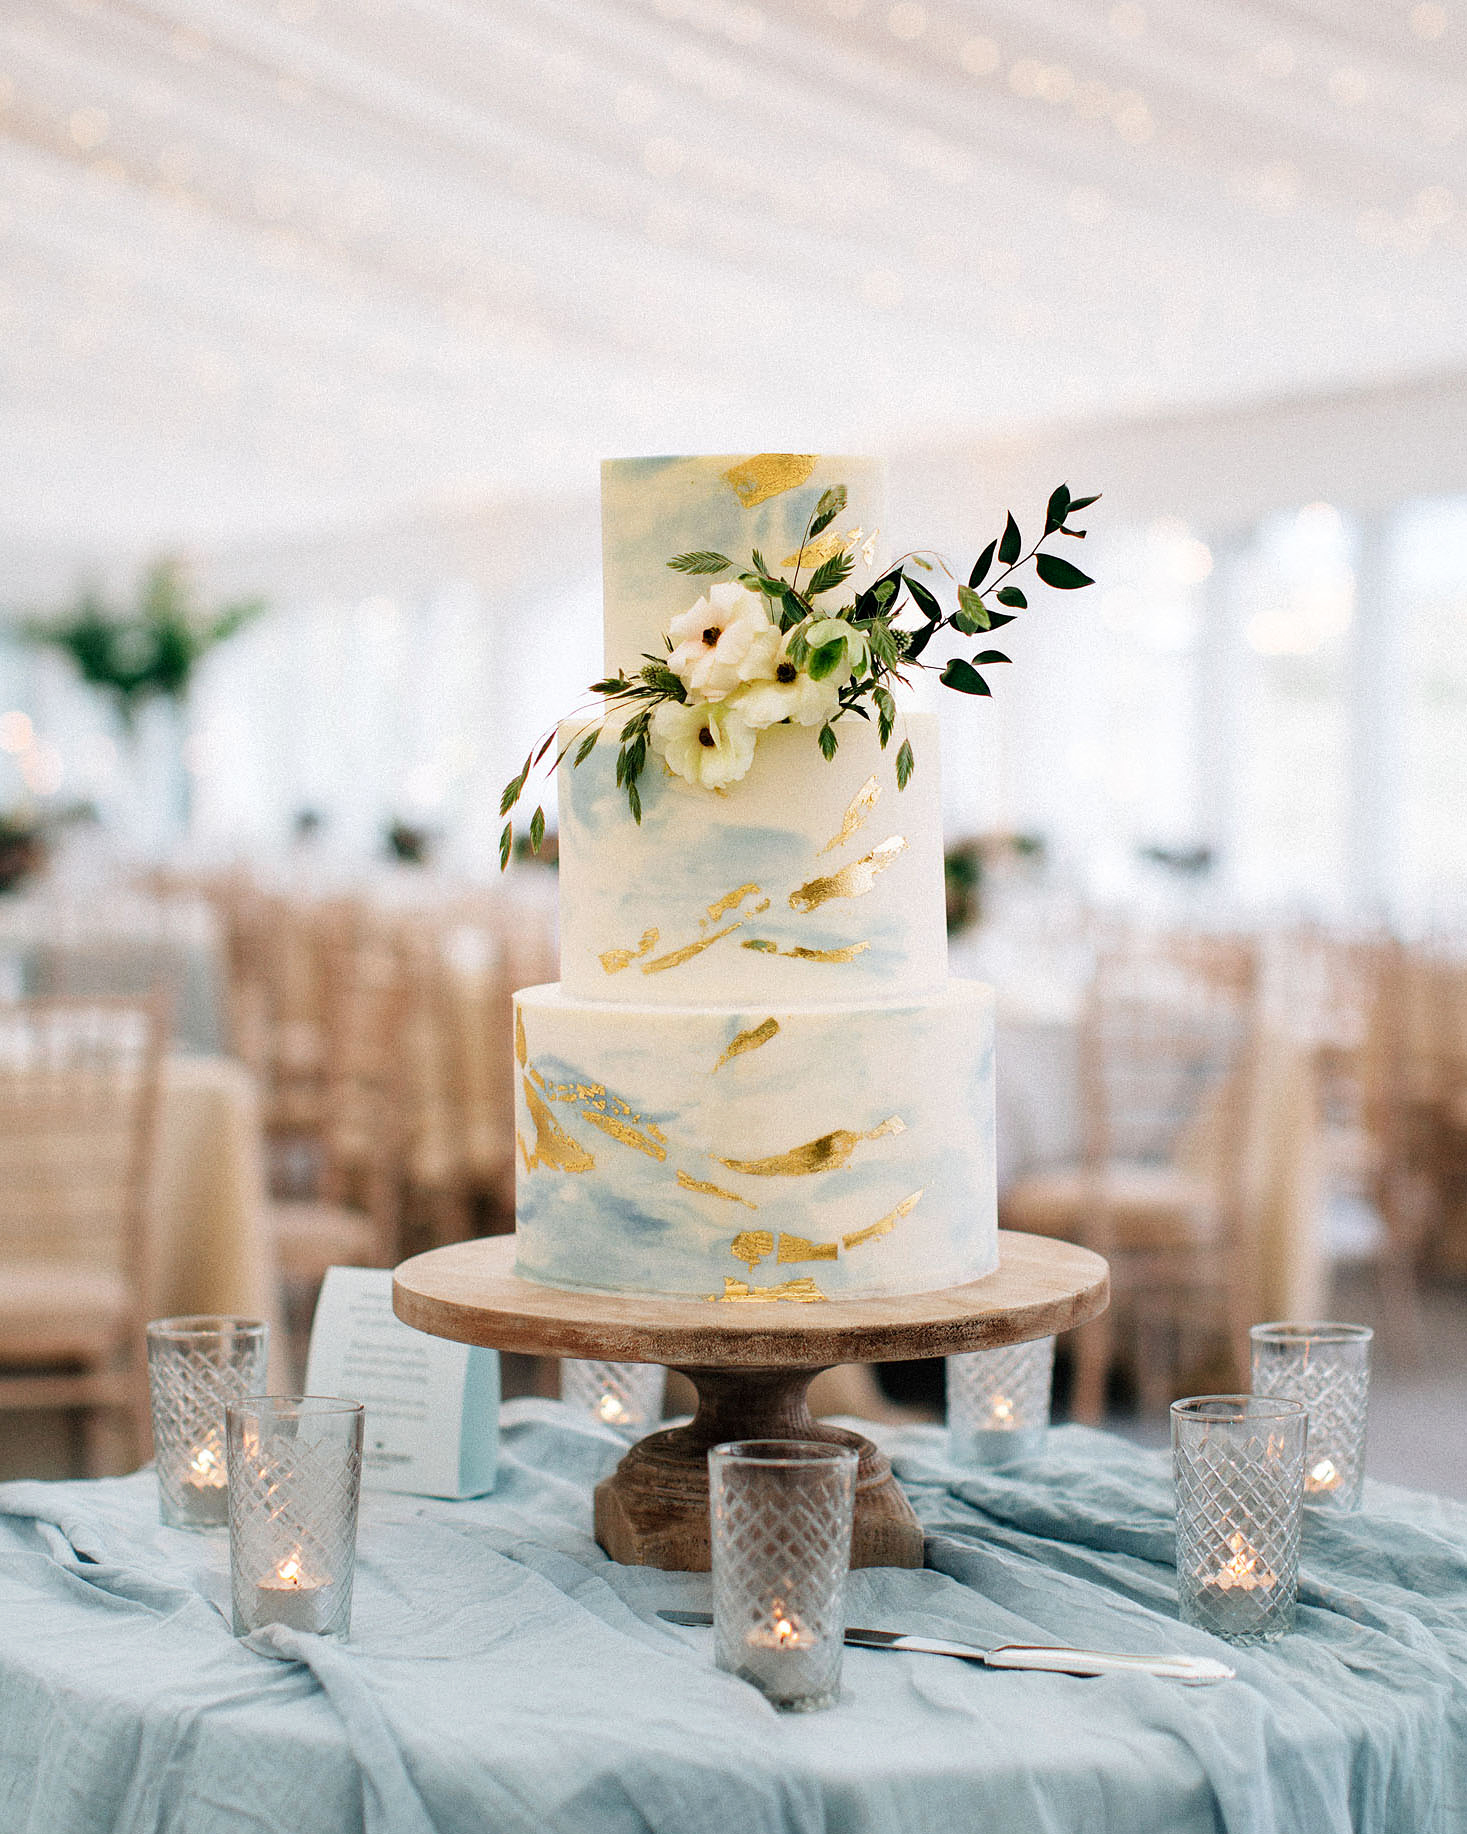 An Inspired Cake